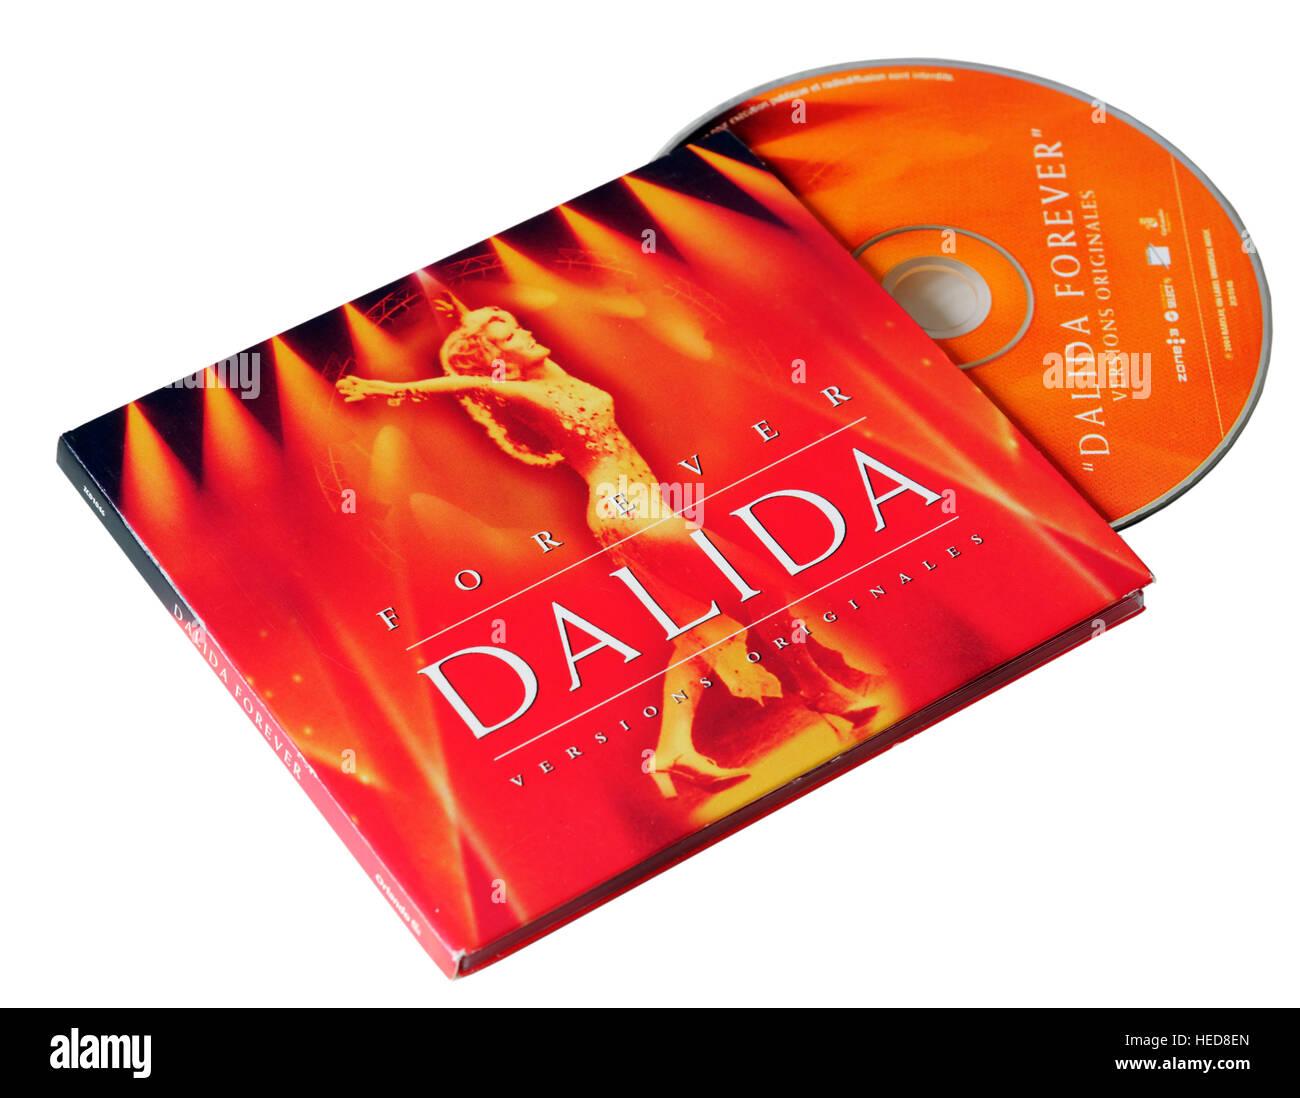 Forever Dalida CD - Stock Image